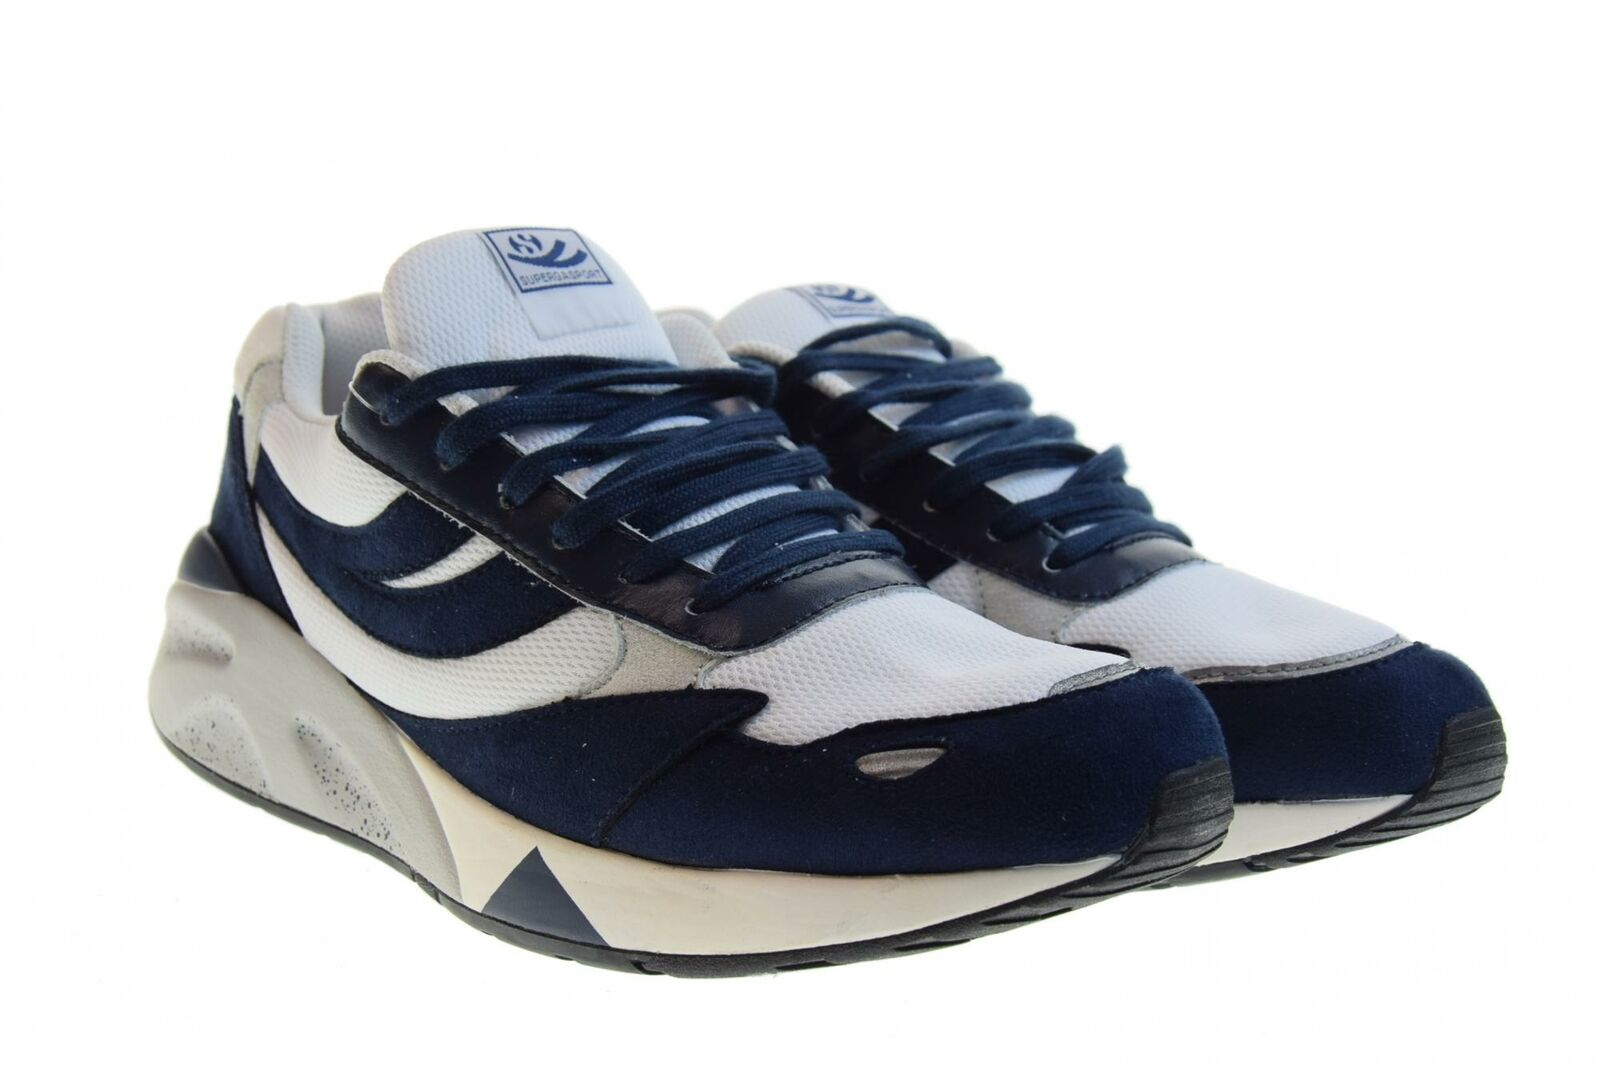 Superga P19s shoes de hombre zapatillas bajas 9320 WINDSYNSUES S00F780 A00